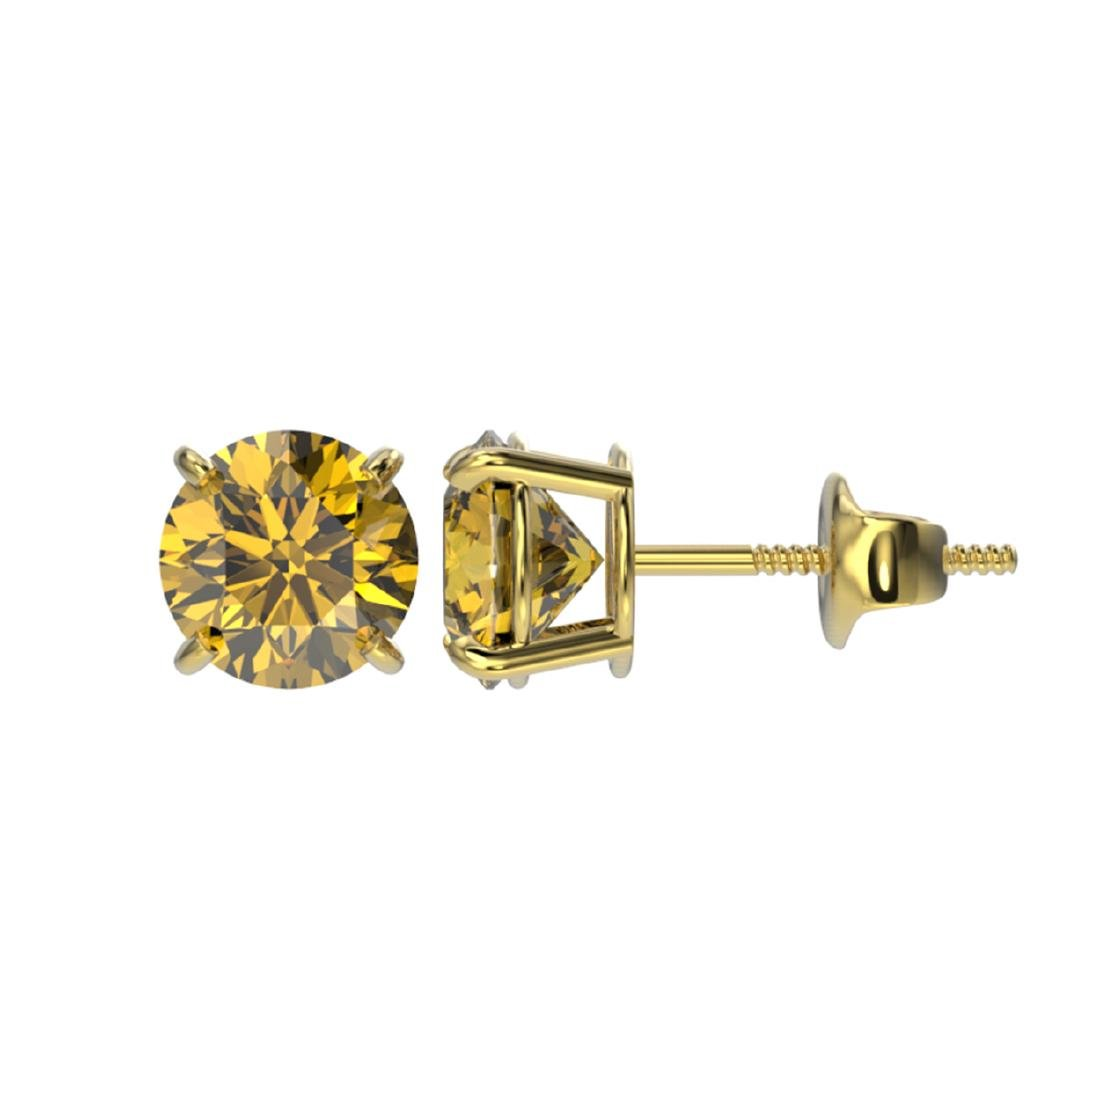 1.54 ctw Intense Yellow Diamond Stud Earrings 10K - 2